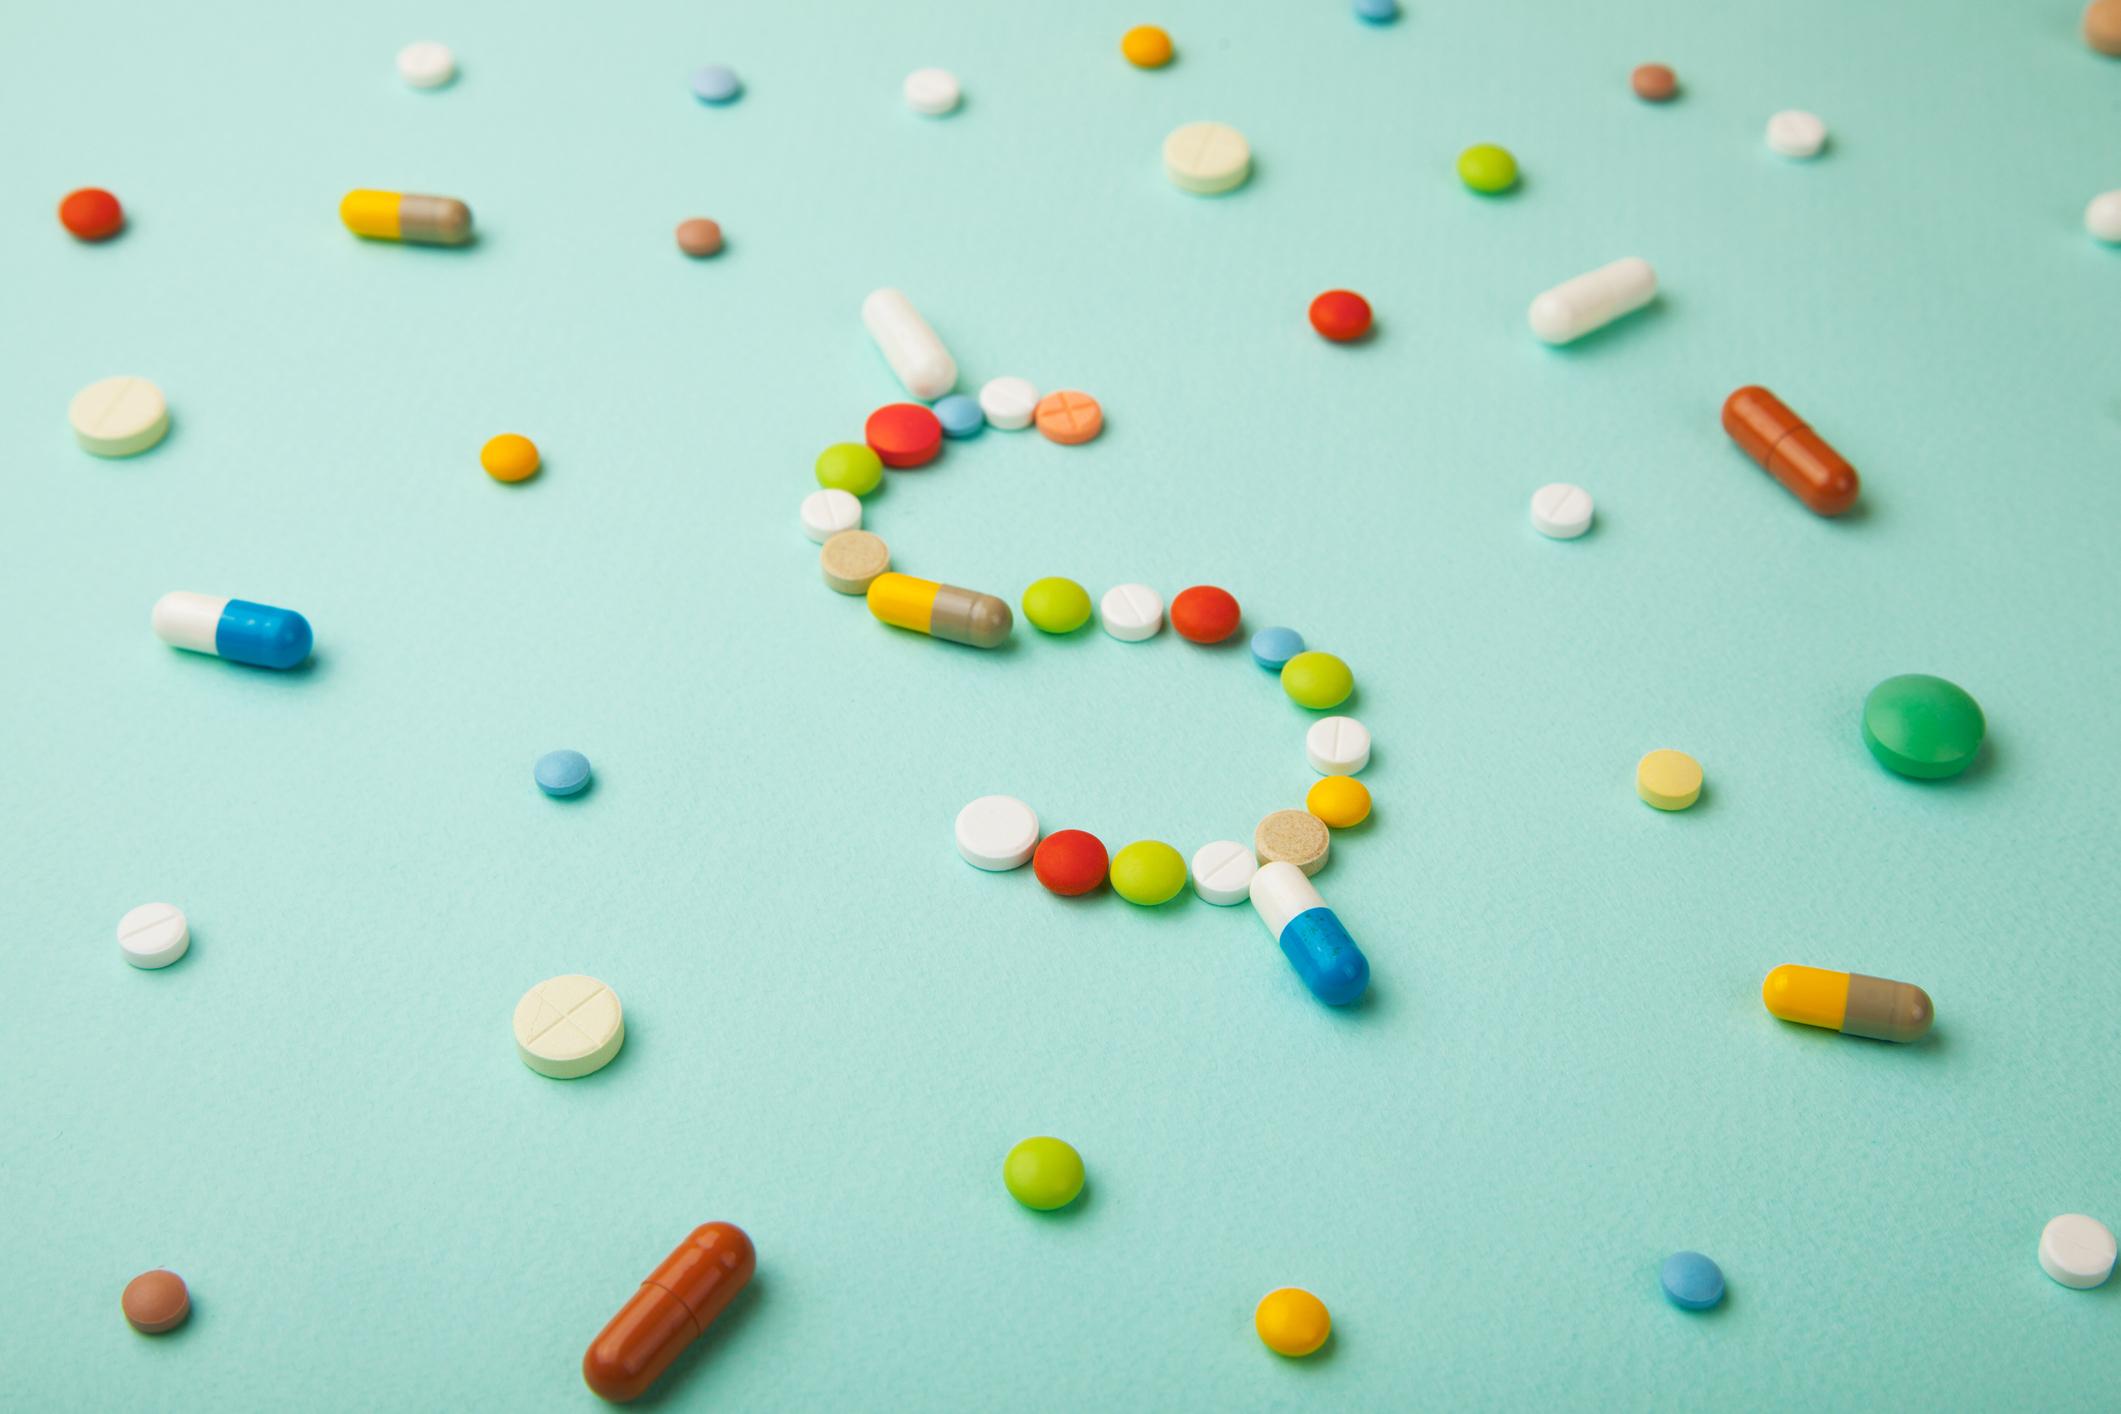 Dollar sign formed in pills